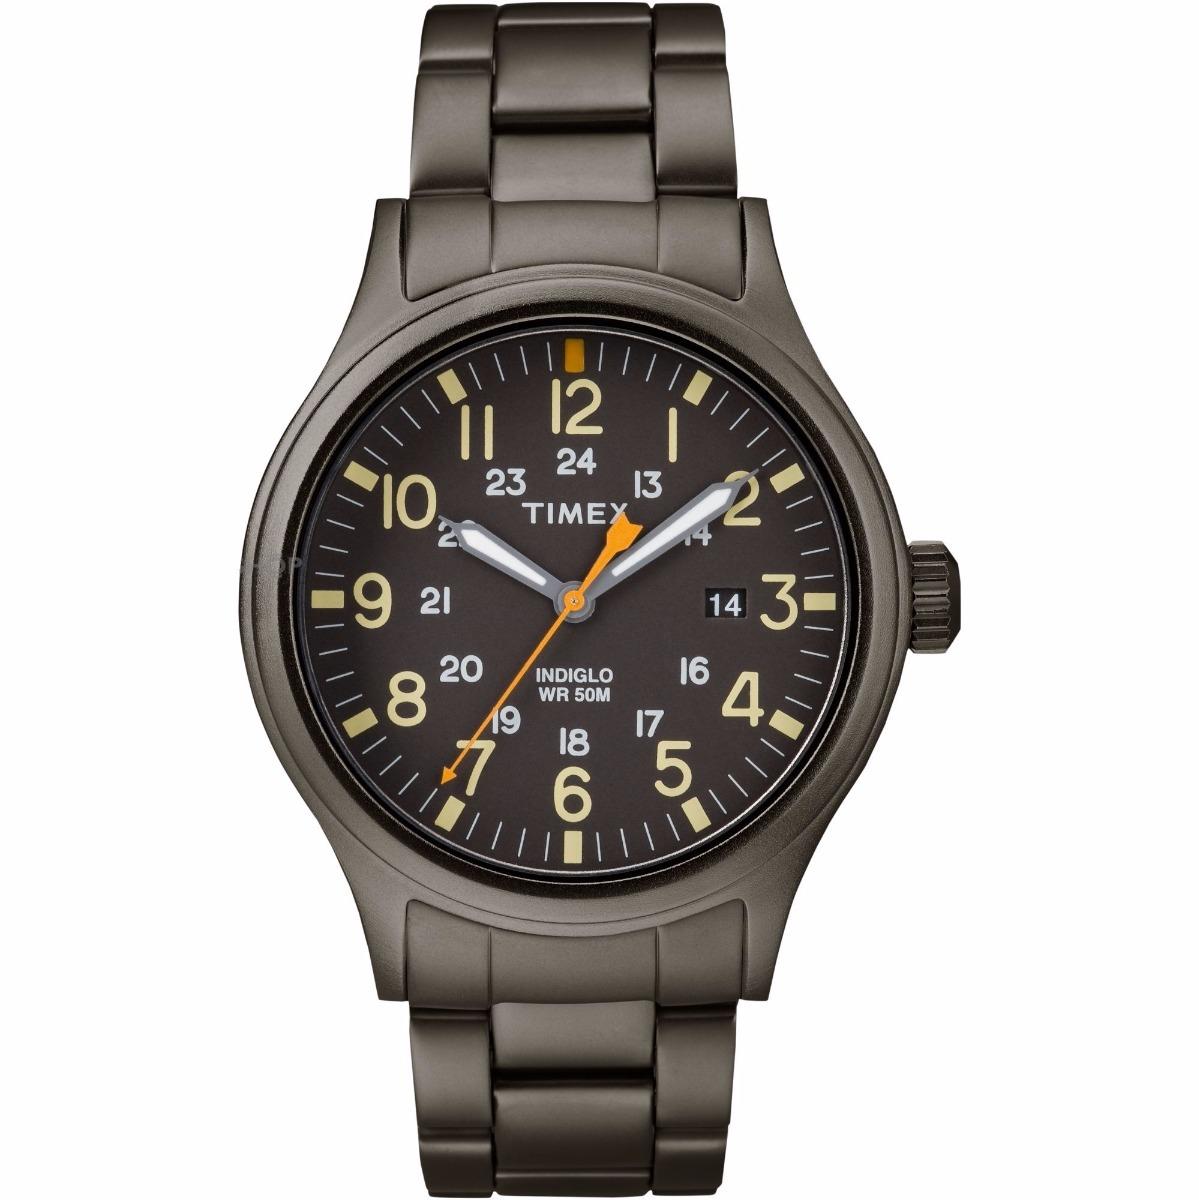 add248b7dfc1 reloj timex allied tw2r46800 d caballero acero gris original. Cargando zoom.